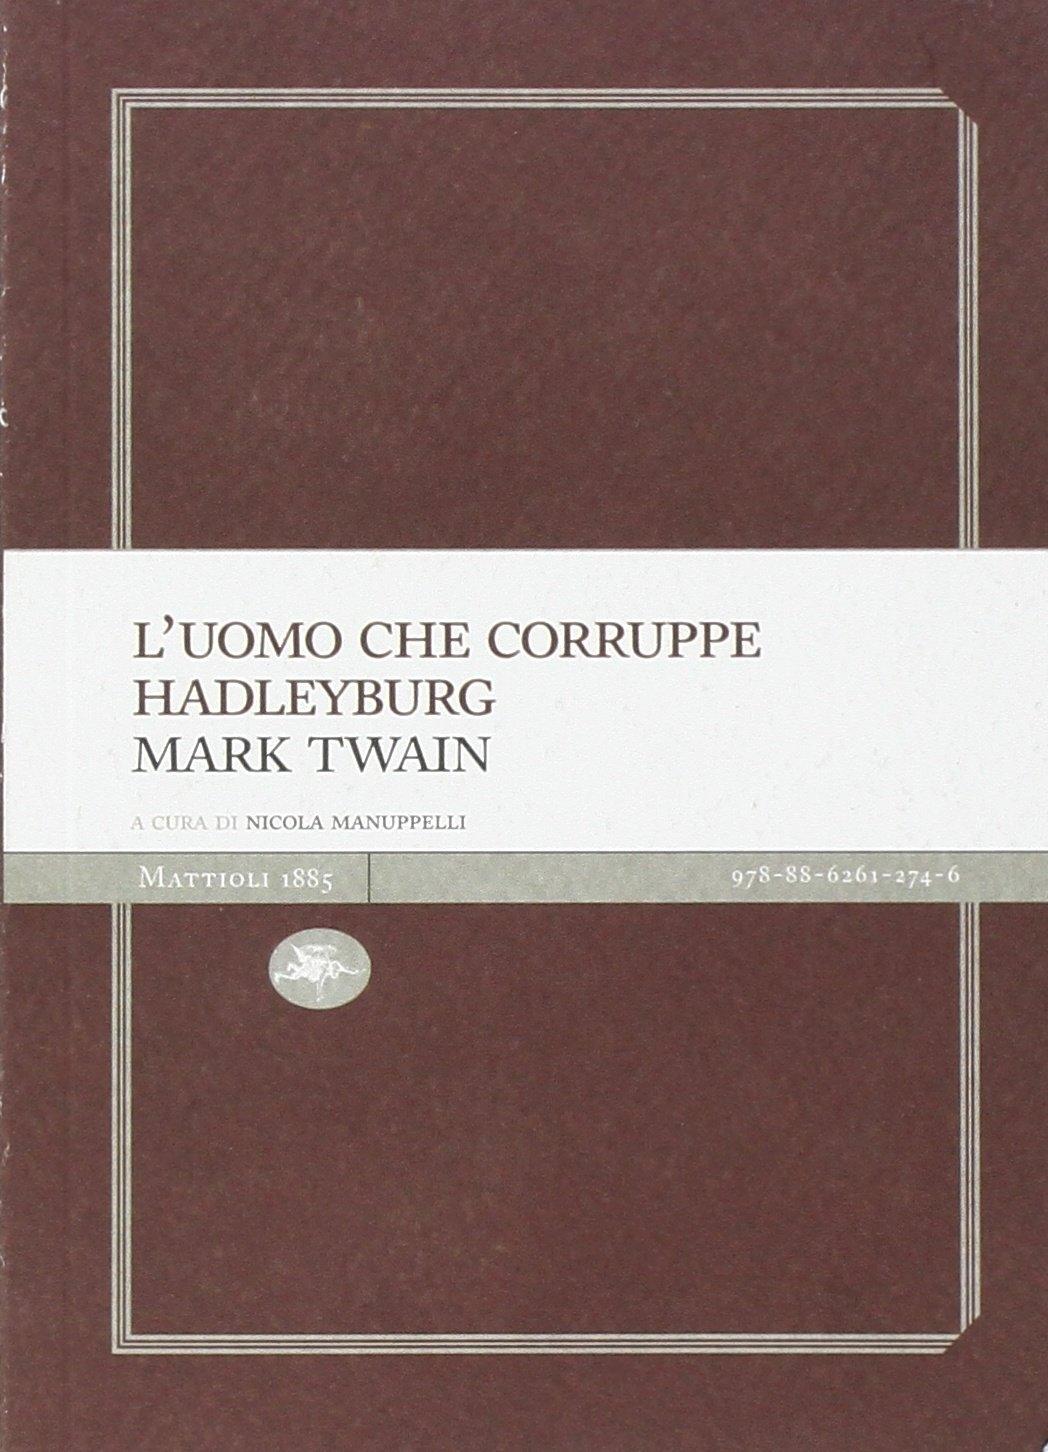 L'uomo che corruppe Hadleyburg